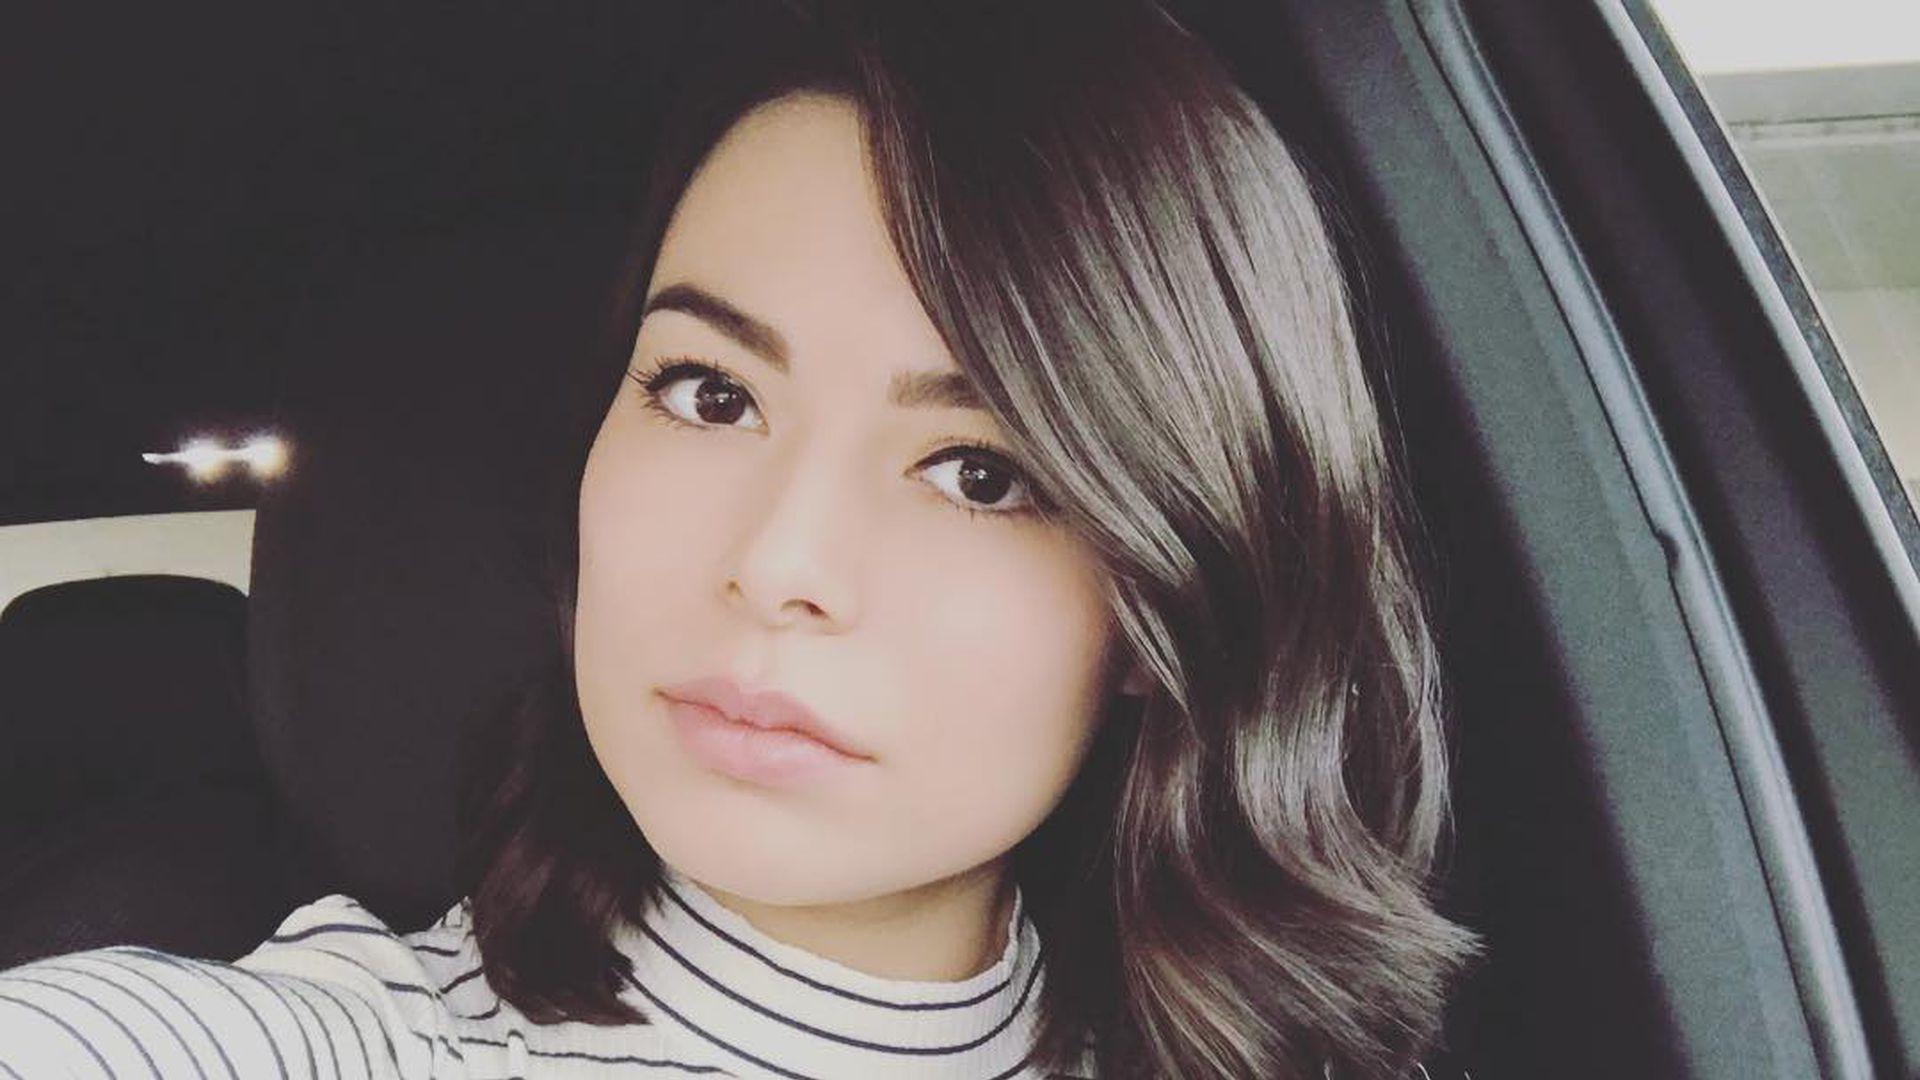 Miranda cosgrove instagram pics jerk off - 3 part 5